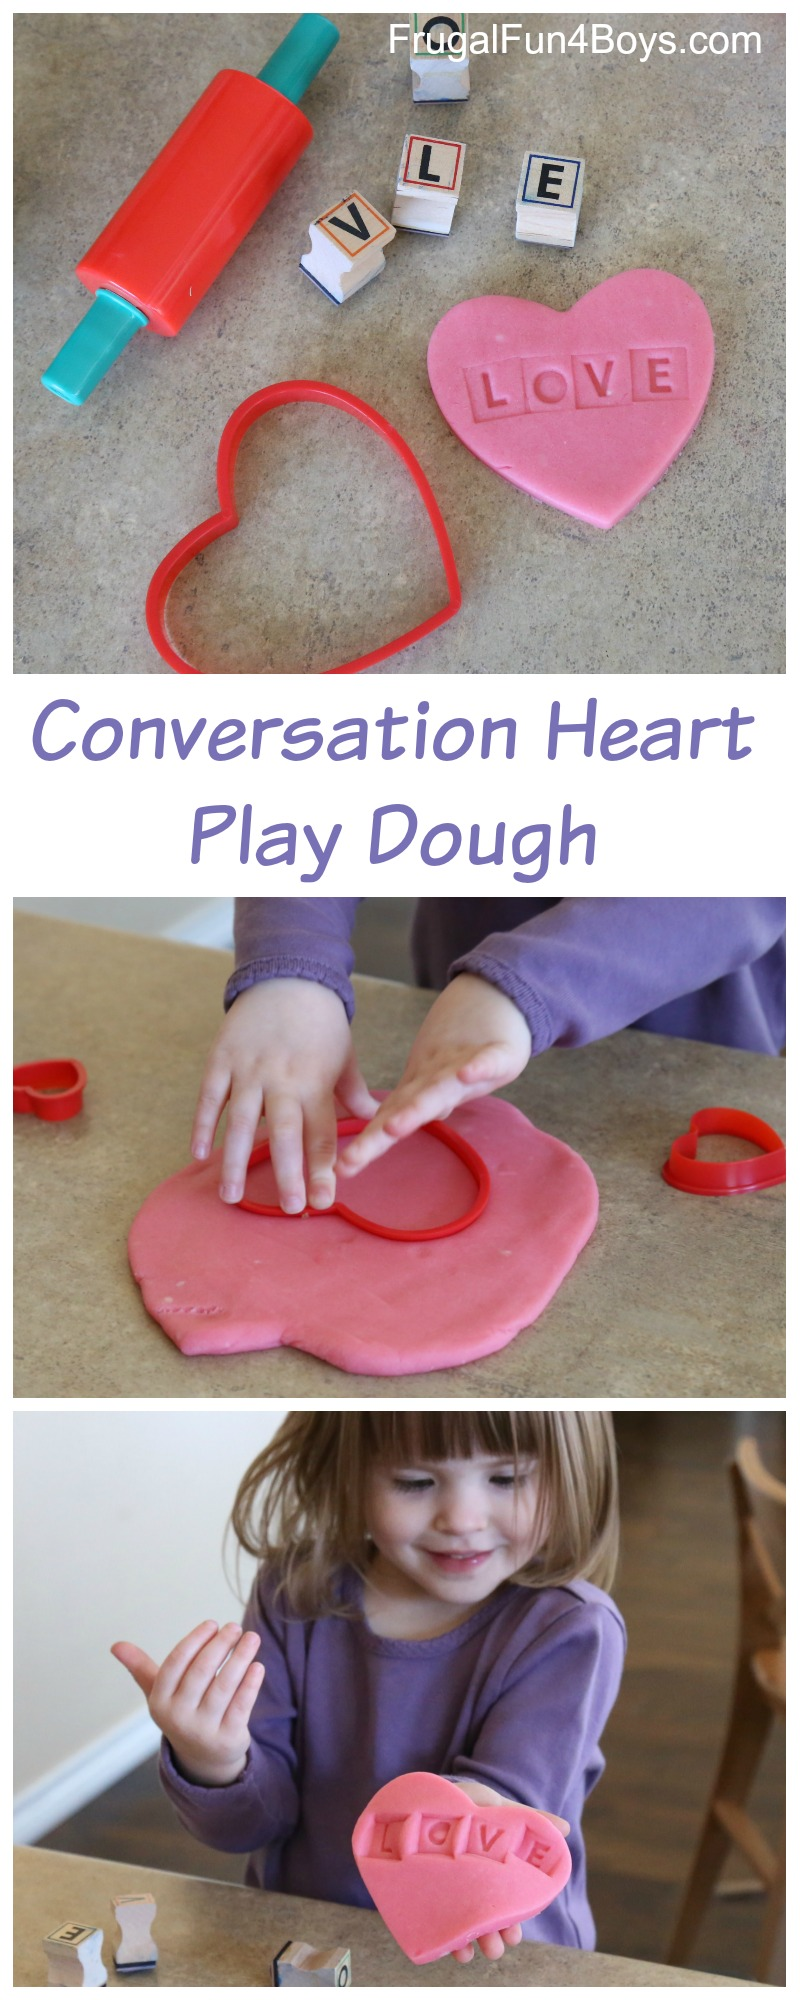 Valentine's Day Activity - Conversation Hearts Play Dough